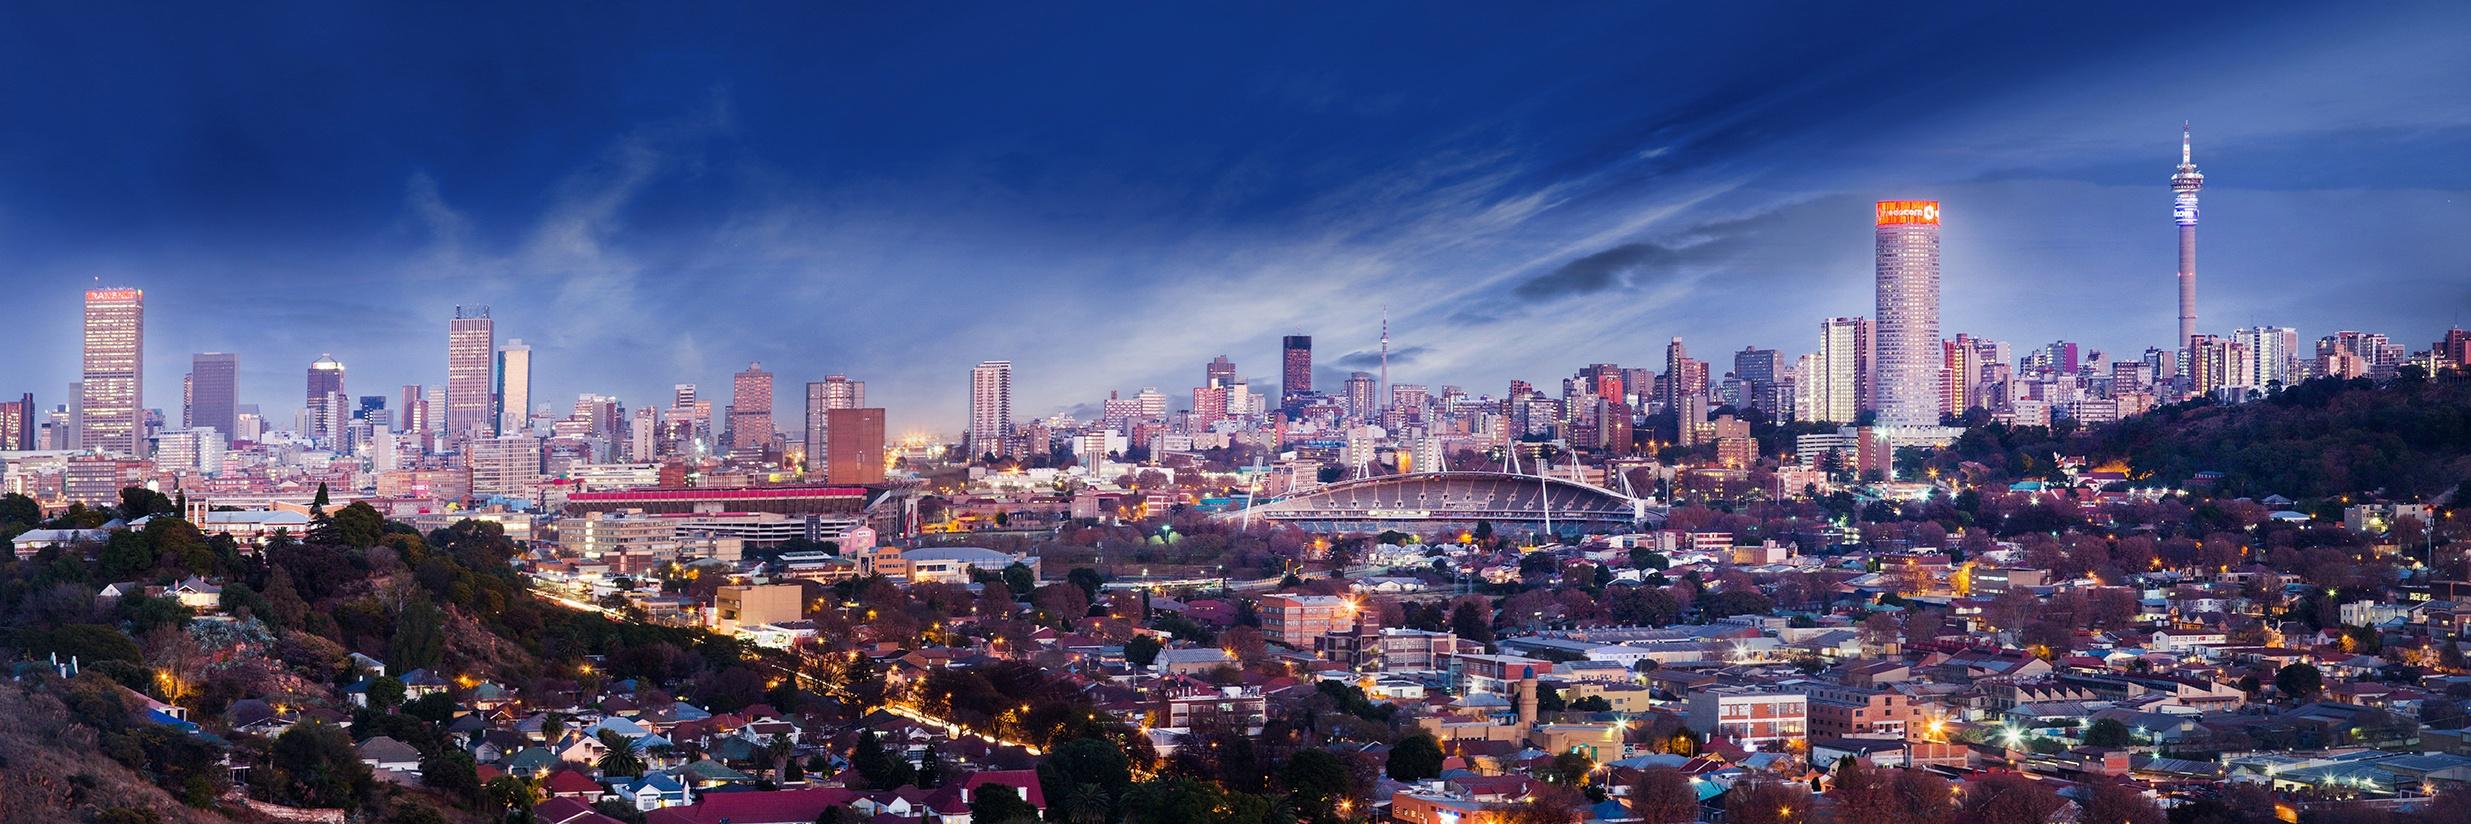 Join Spitfire Inbound at the next Johannesburg HubSpot User Group